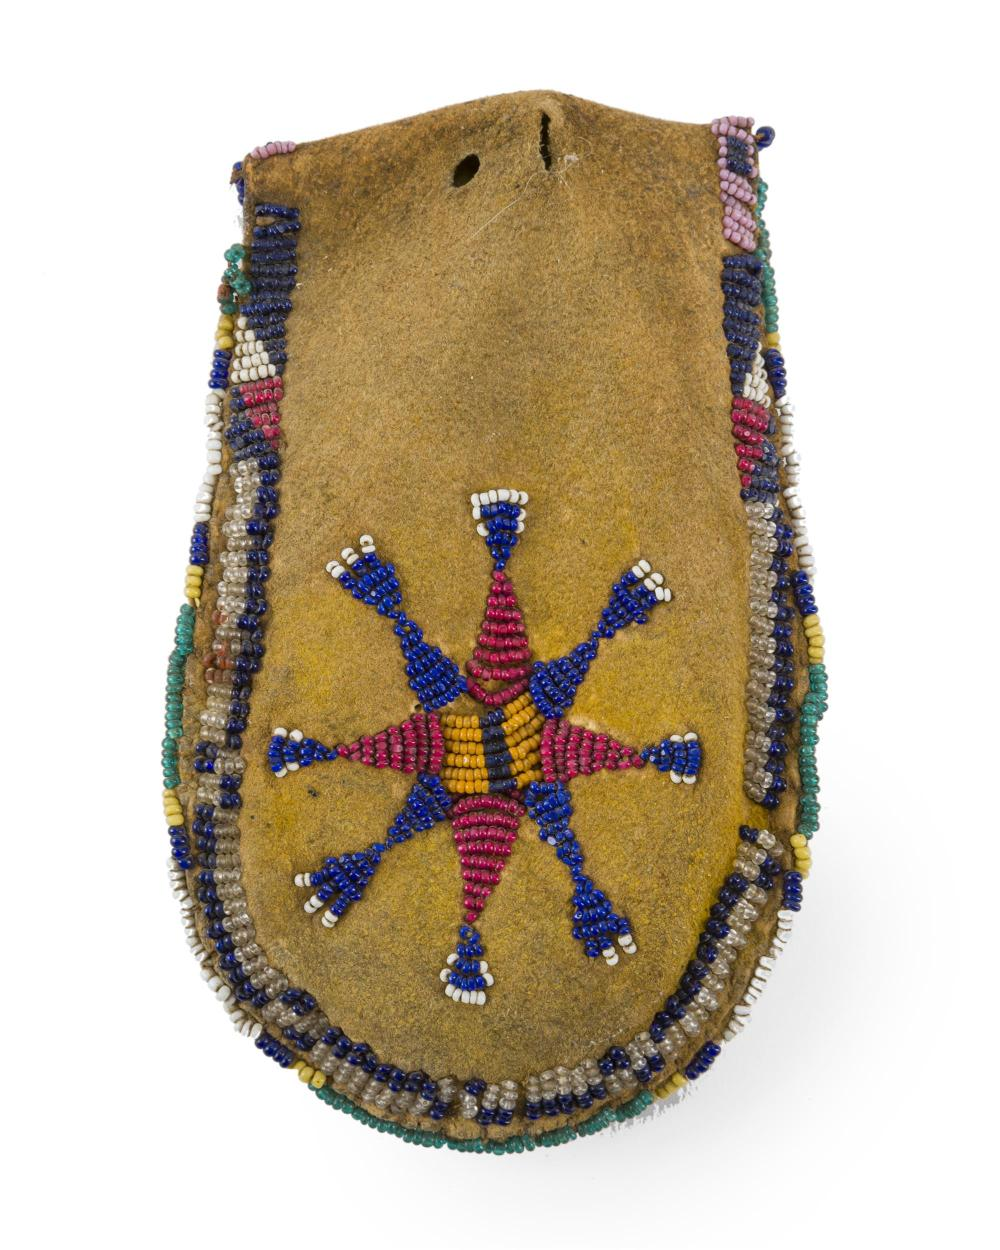 A Plains Indian beaded hide token bag